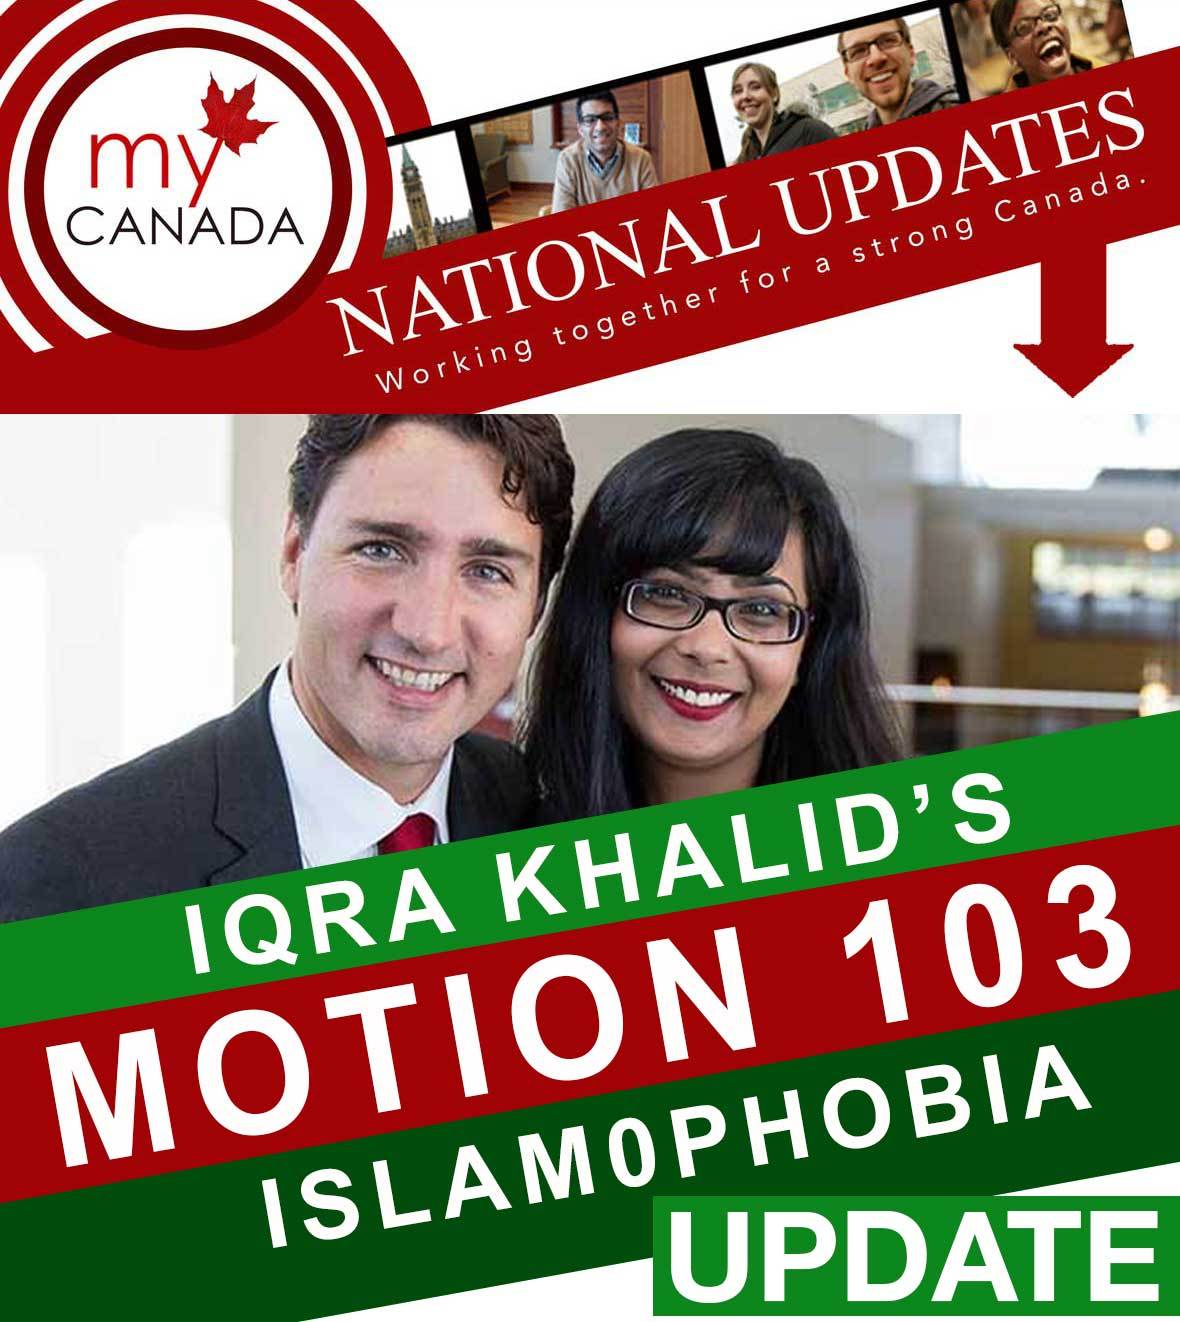 IslamophobiaUpdate